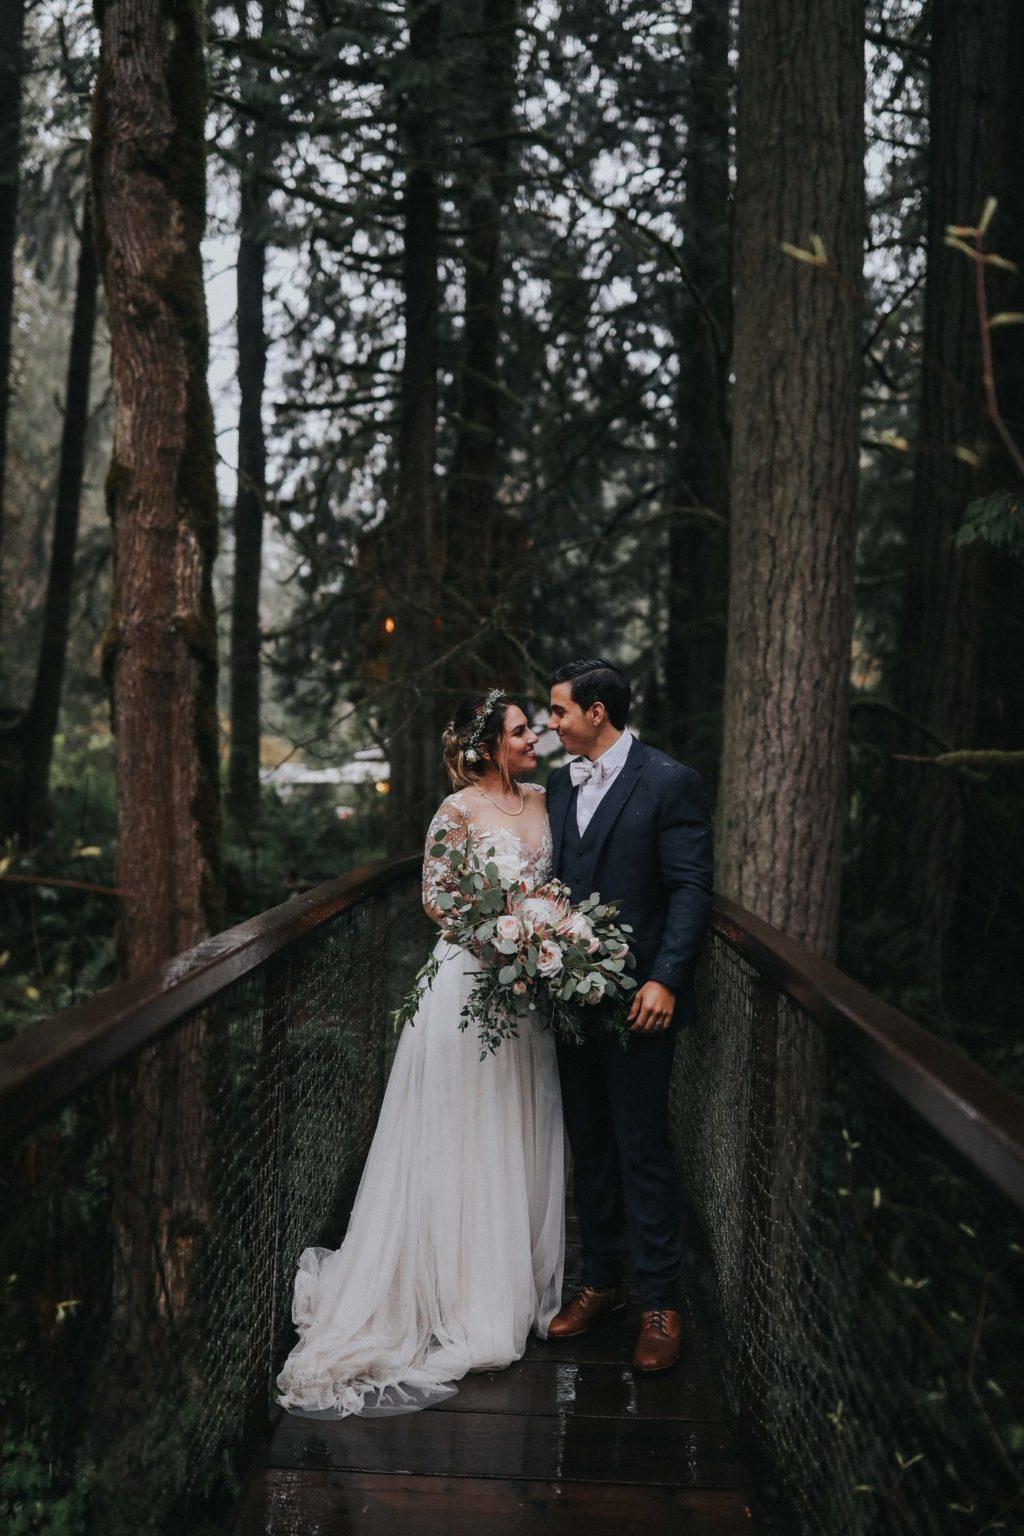 bride and groom smiling on suspension bridge